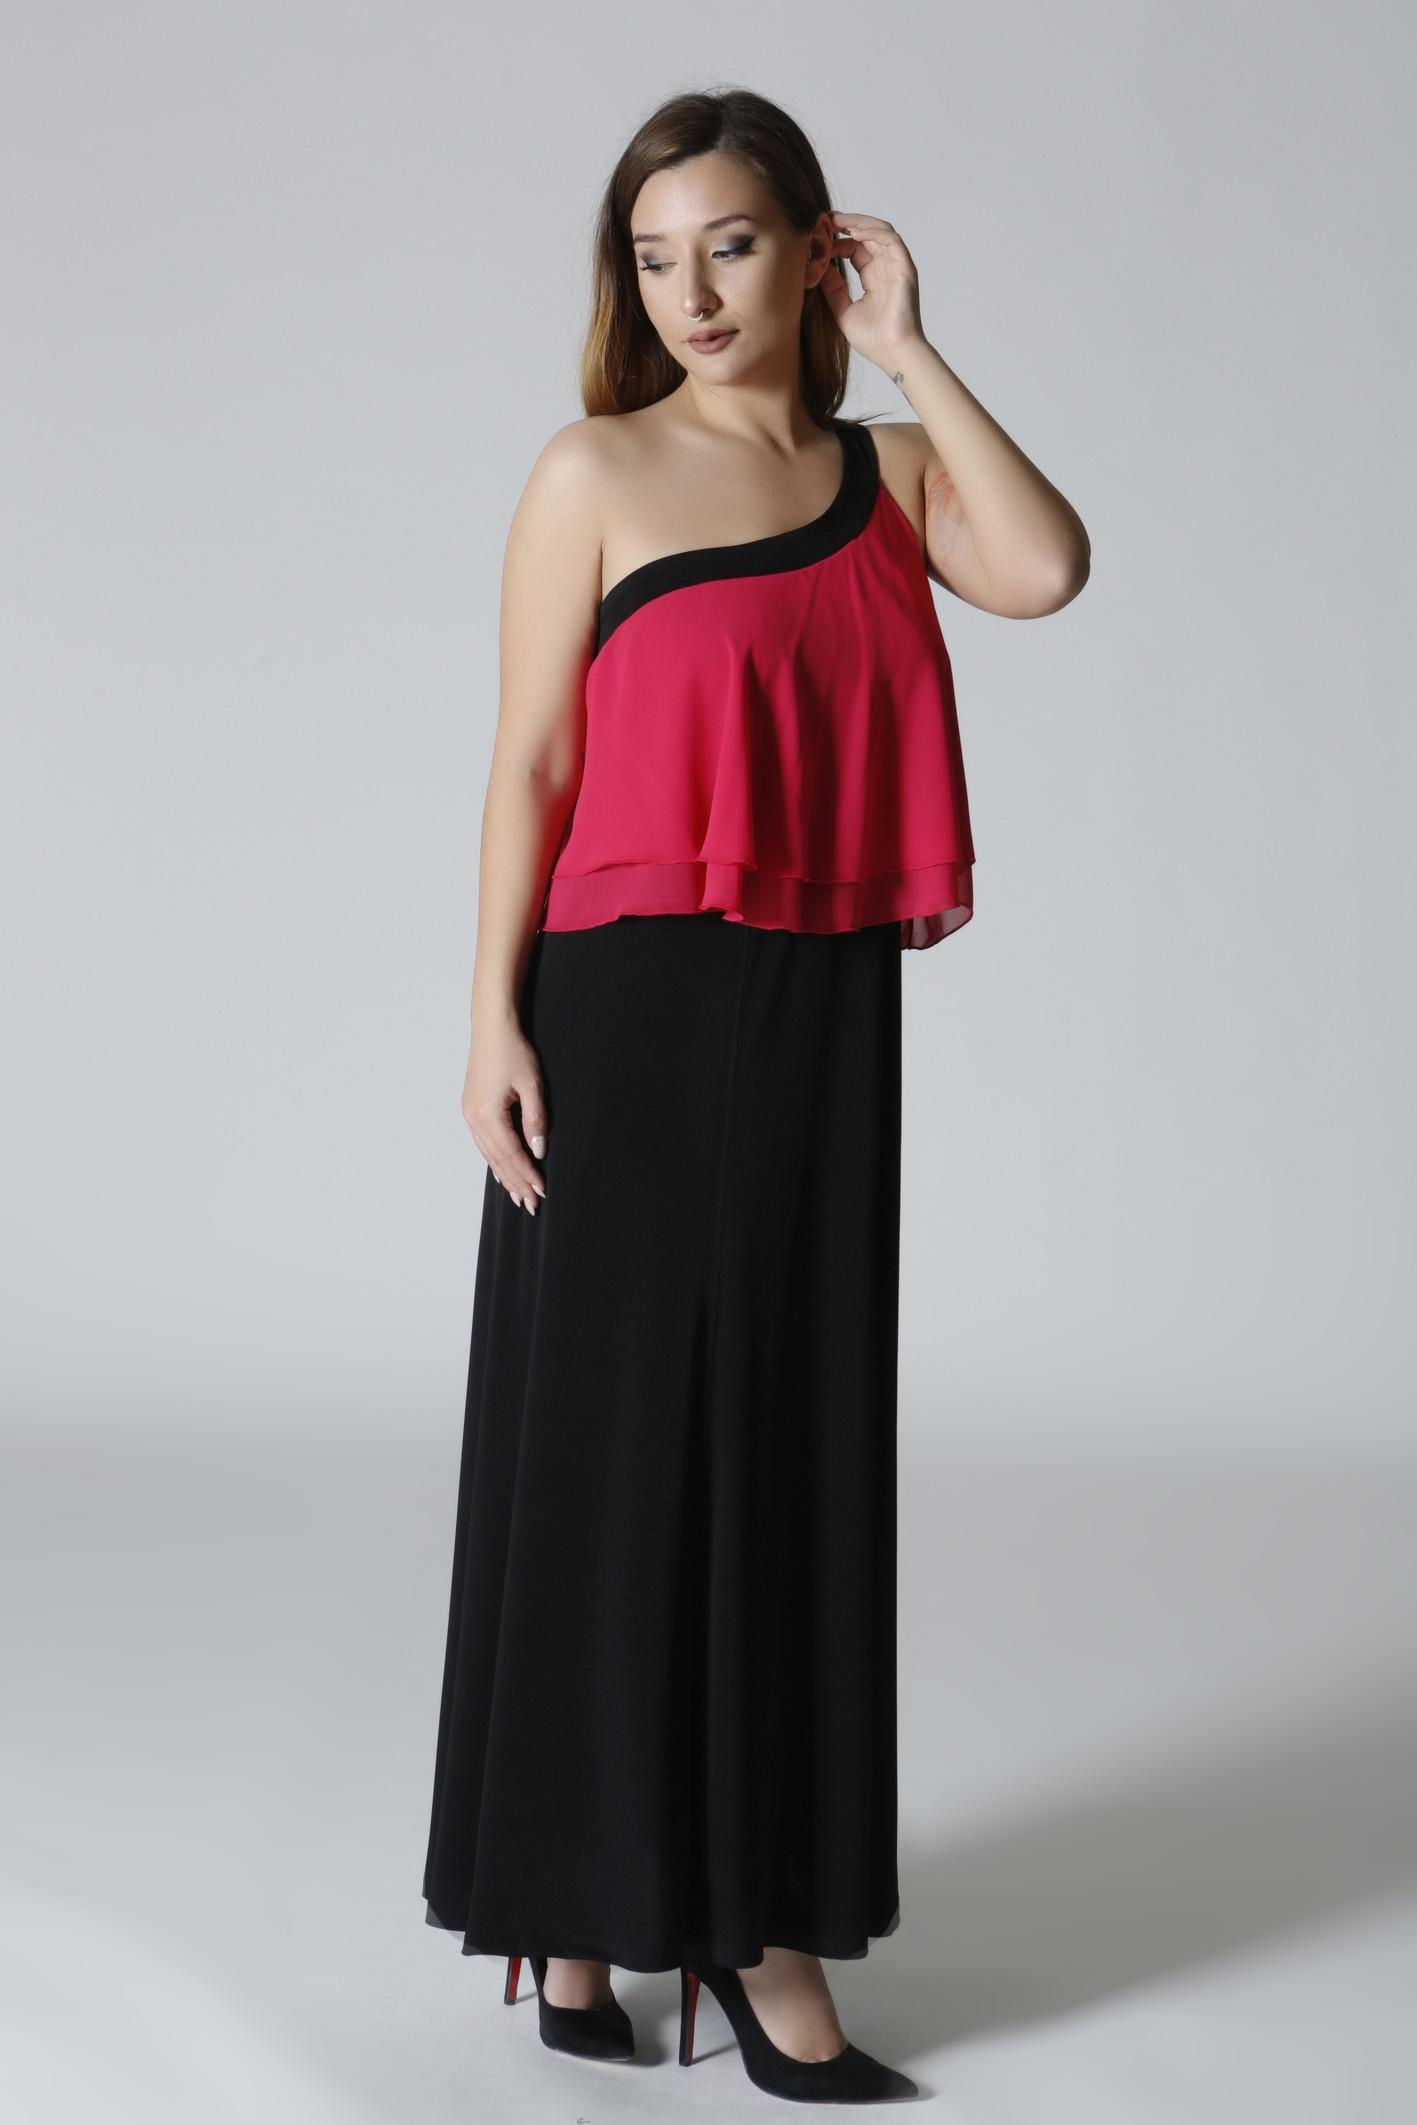 586ba2ff220b Maxi φόρεμα μαύρο φούξια